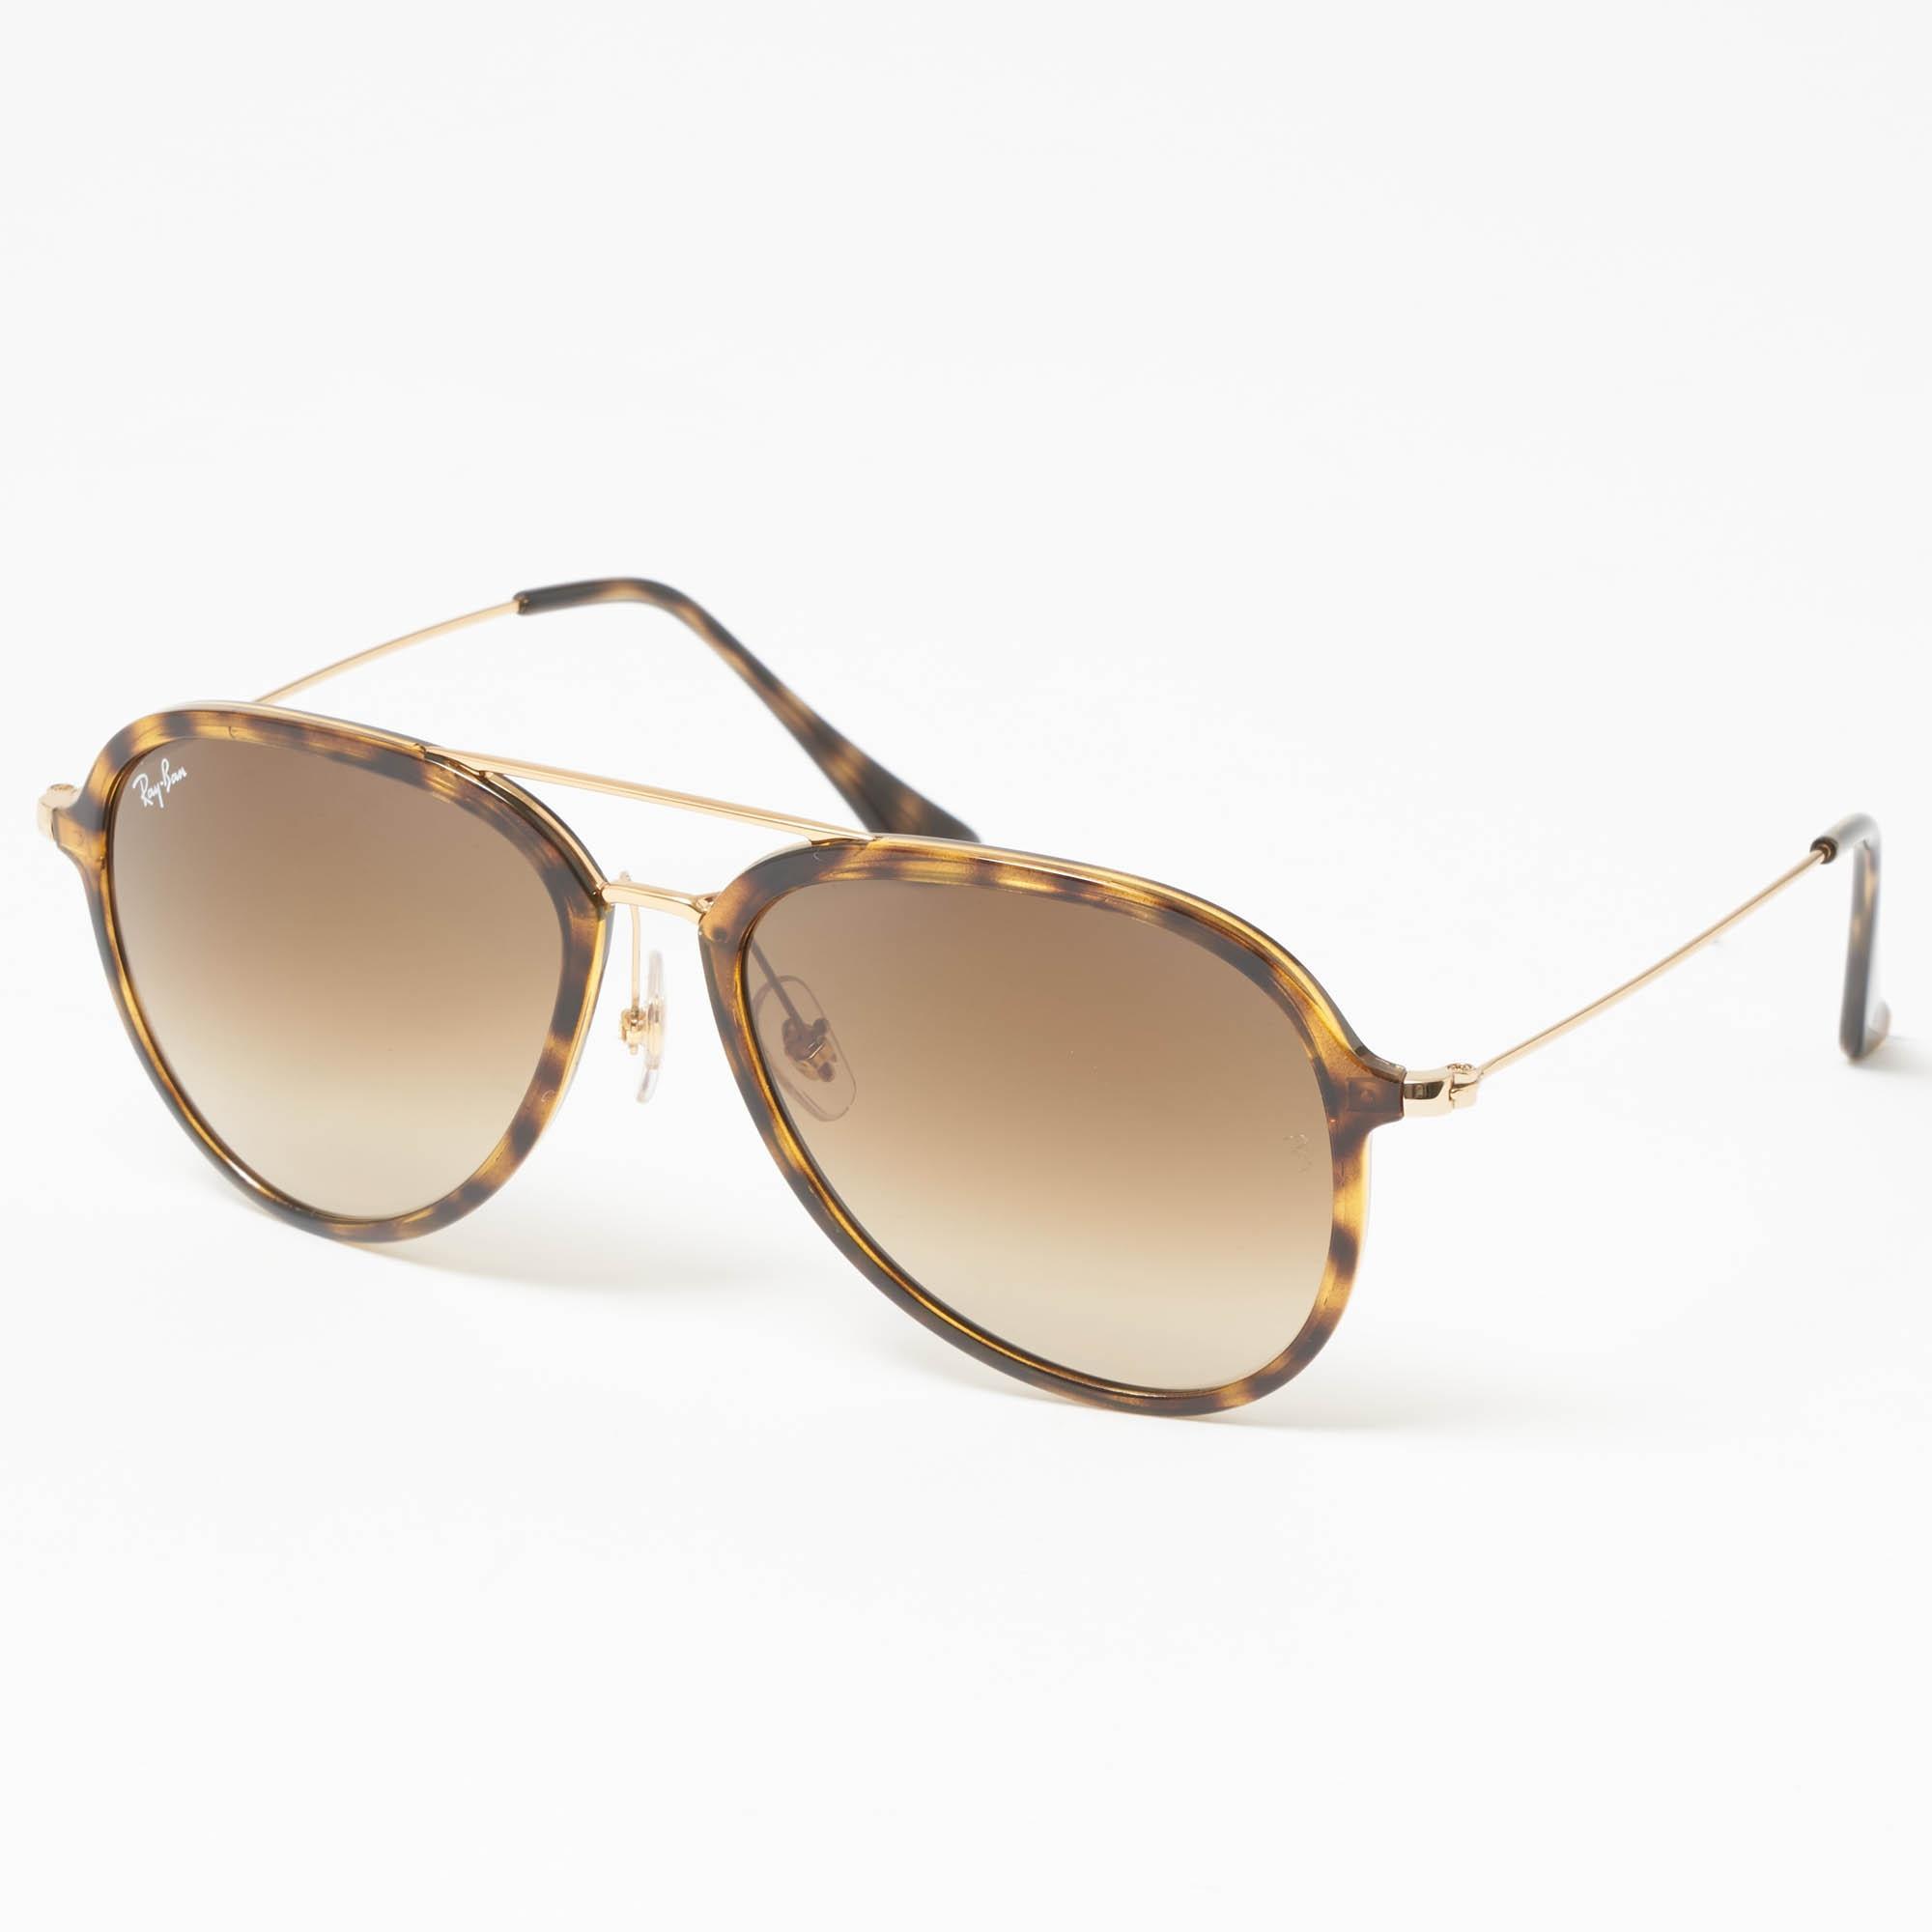 05e44339e59 Lyst - Ray-Ban Tortoise Rb4298 Sunglasses - Light Brown Gradient ...